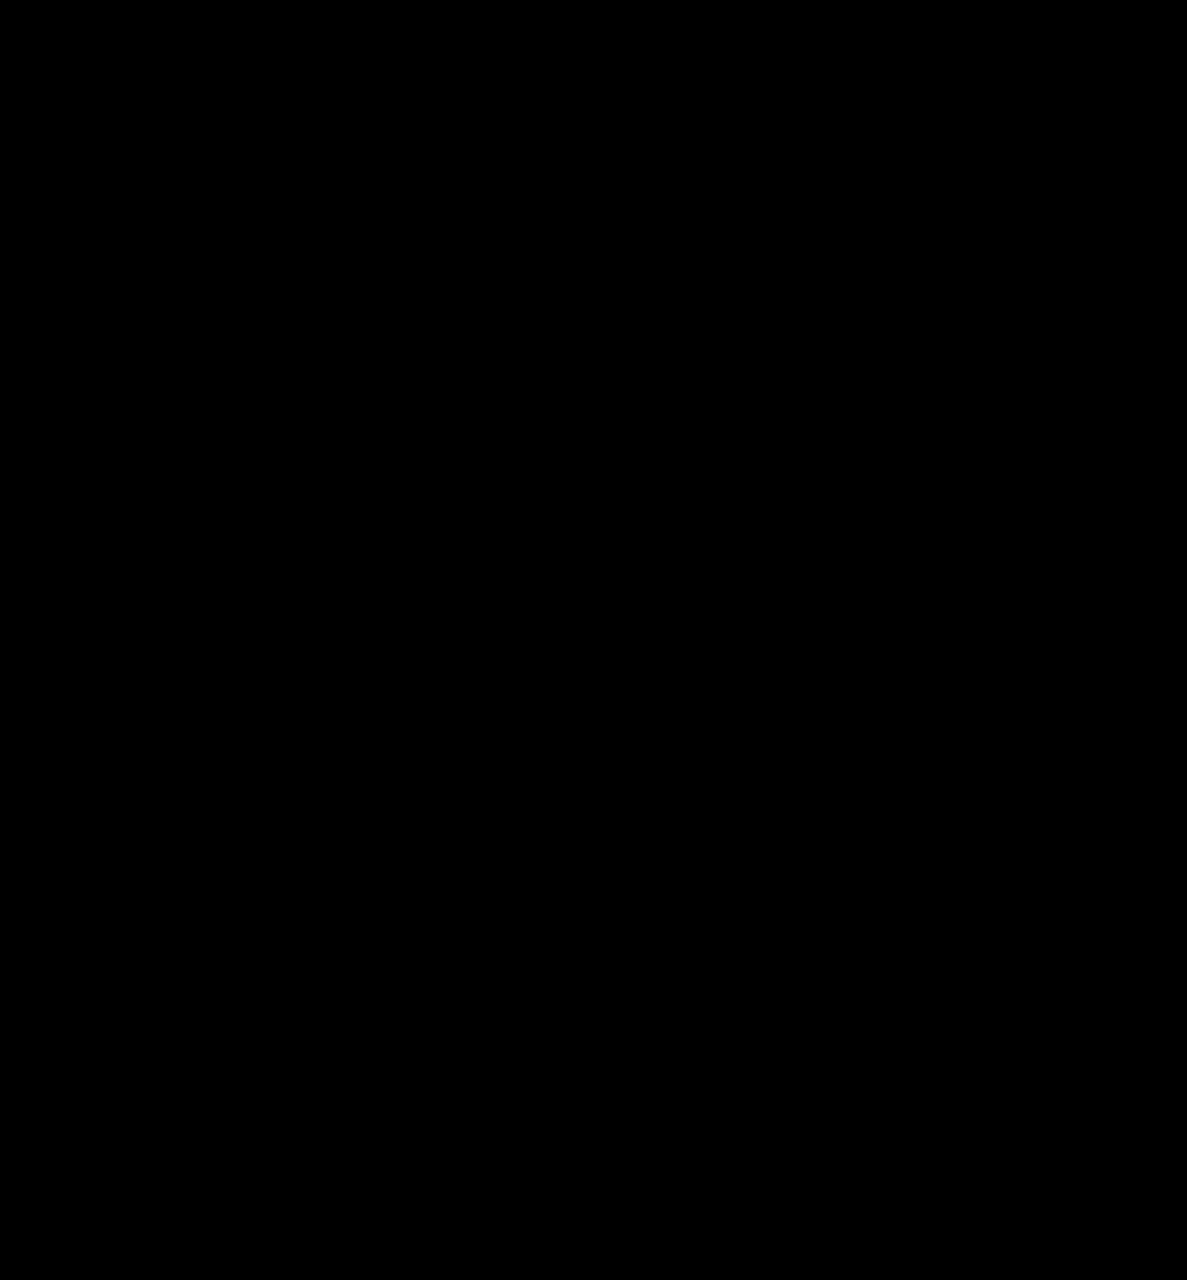 18061201